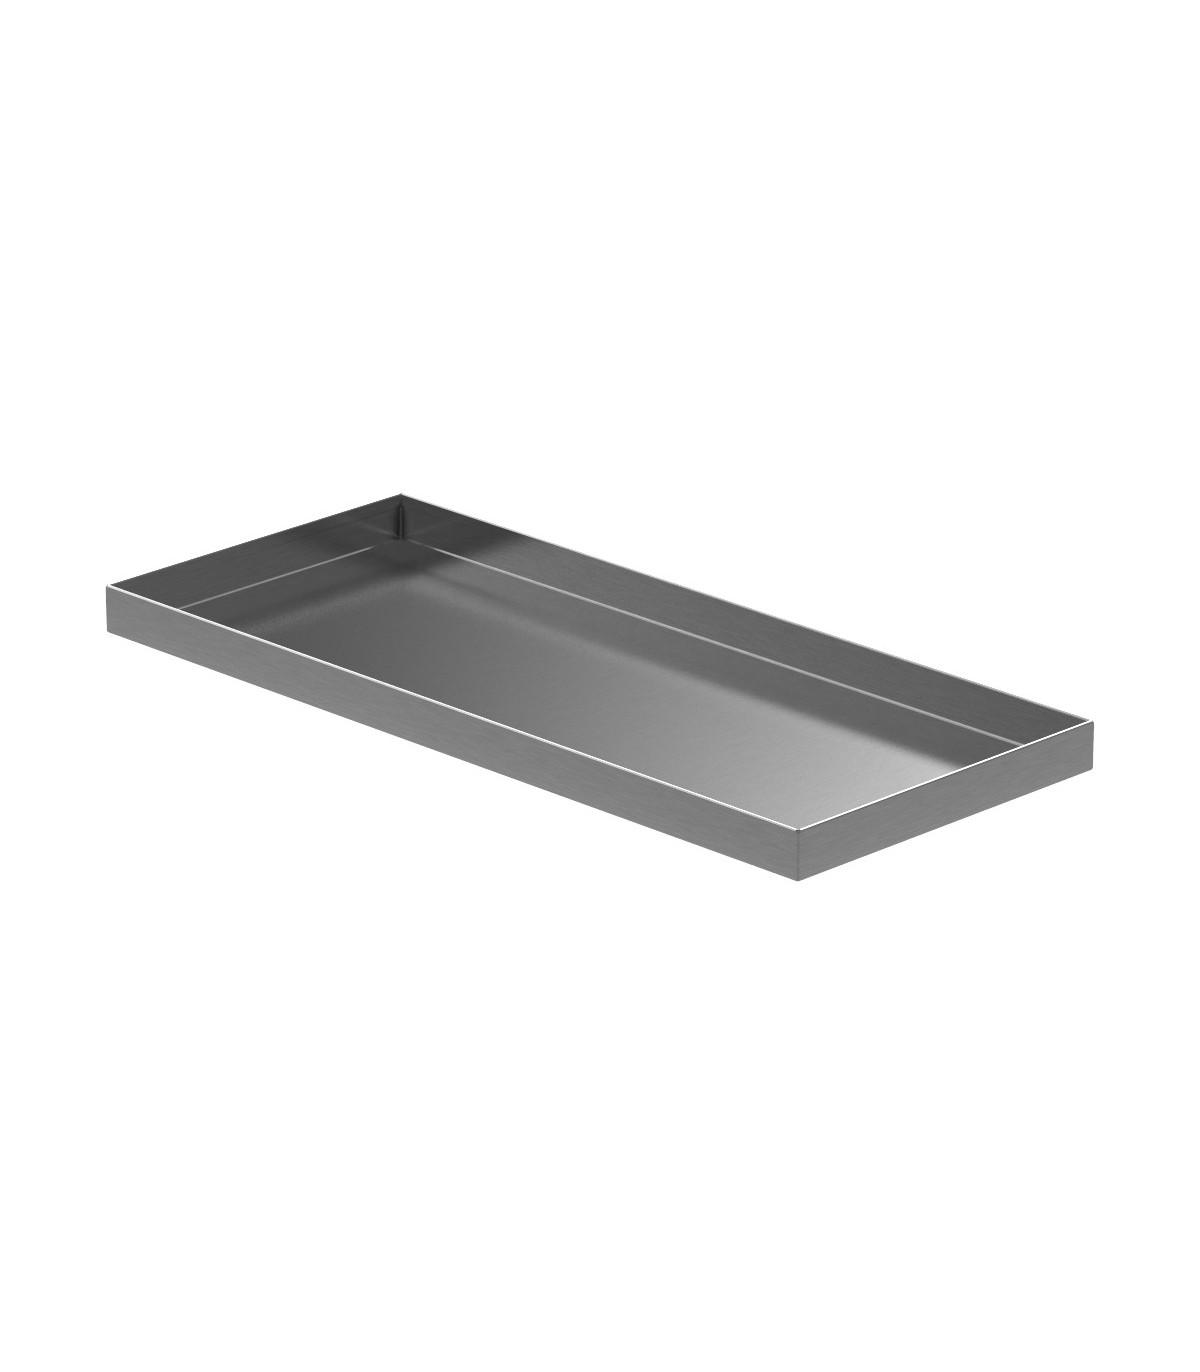 Air Conditioner Drip Tray